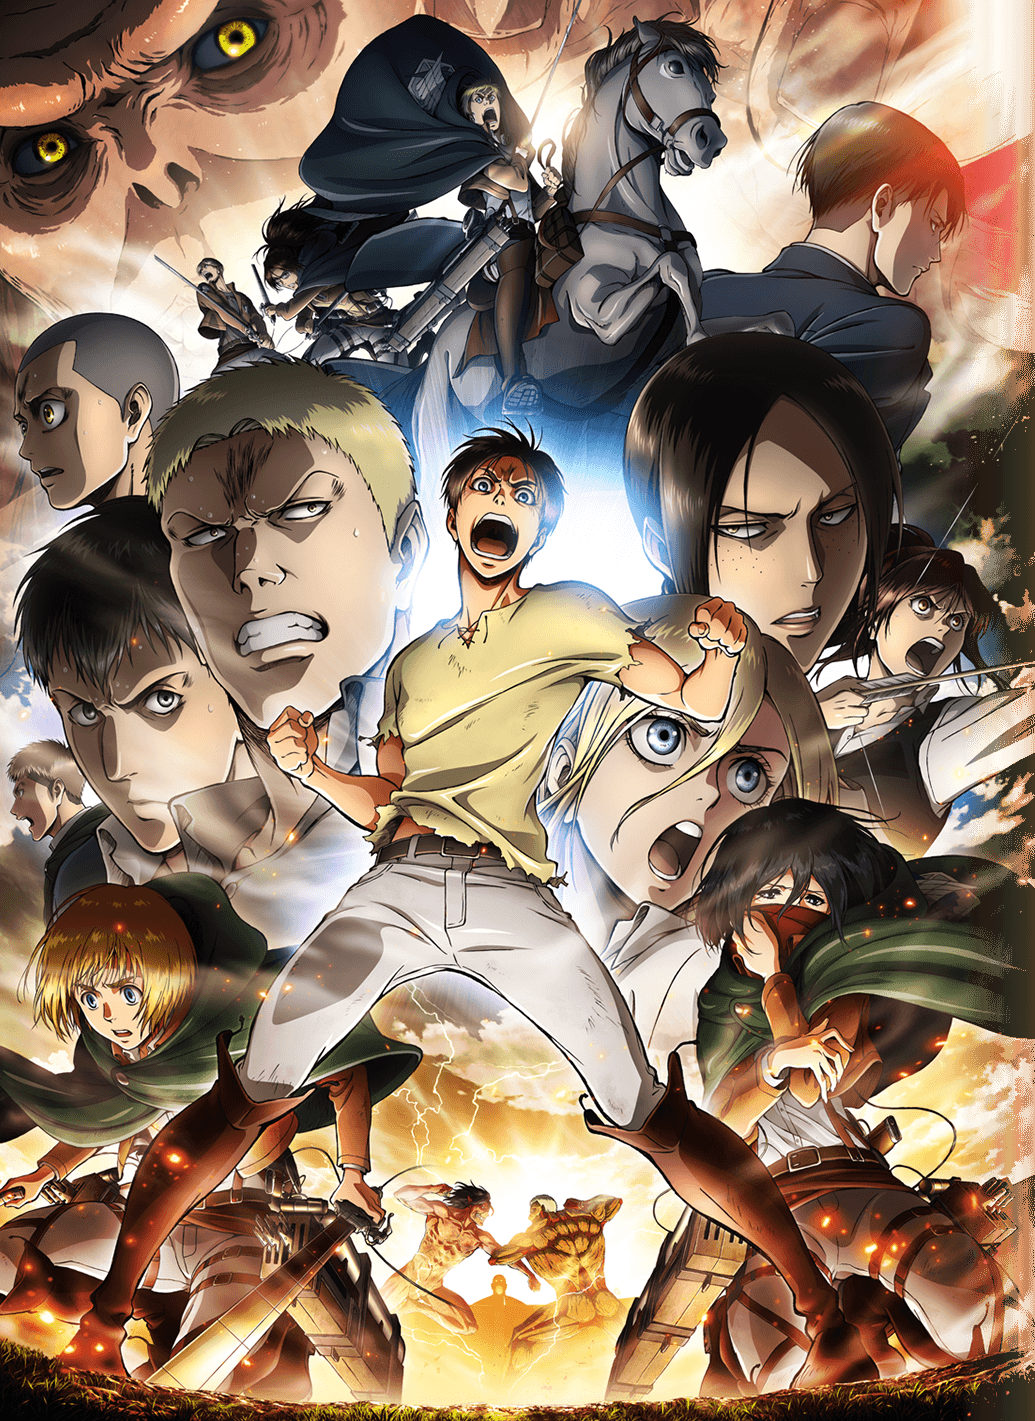 Shingeki No Kyojin 2nd Season هجوم العمالقة الحلقة 11 الموسم التاني مترجمة اون لاين Shahiid Anime